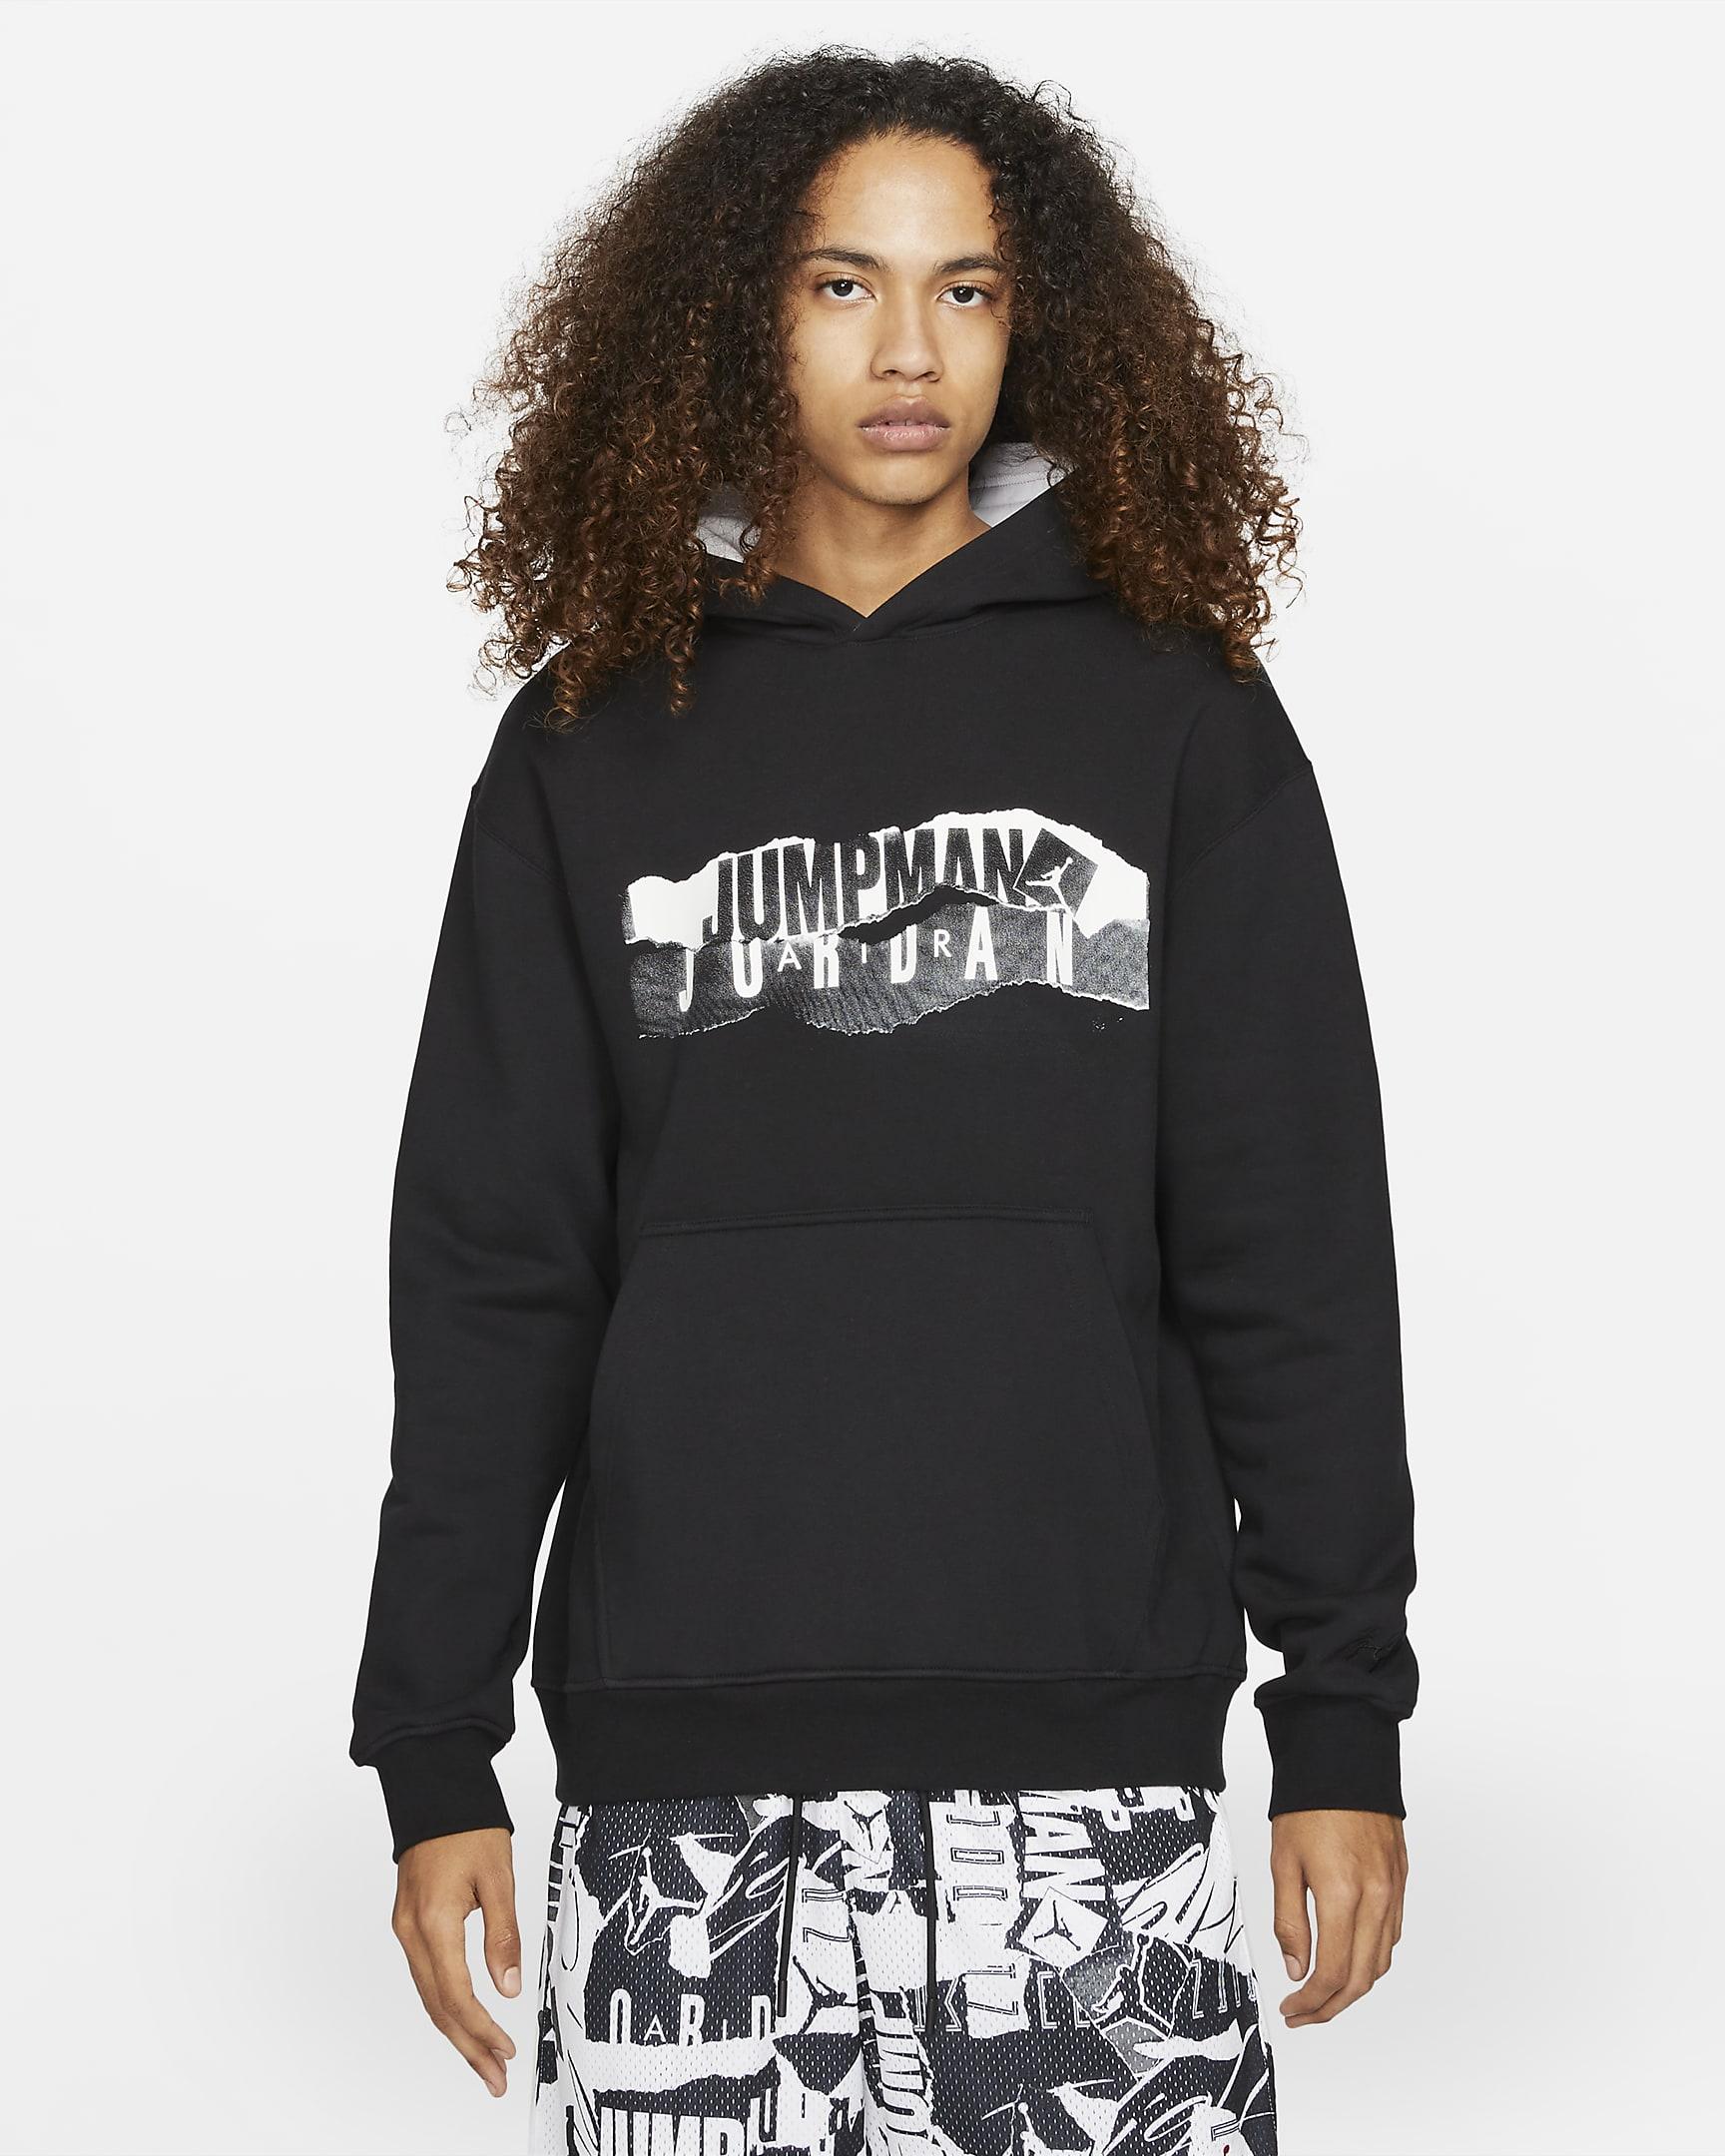 jordan-essential-mens-fleece-graphic-hoodie-L4wV9m-1.png